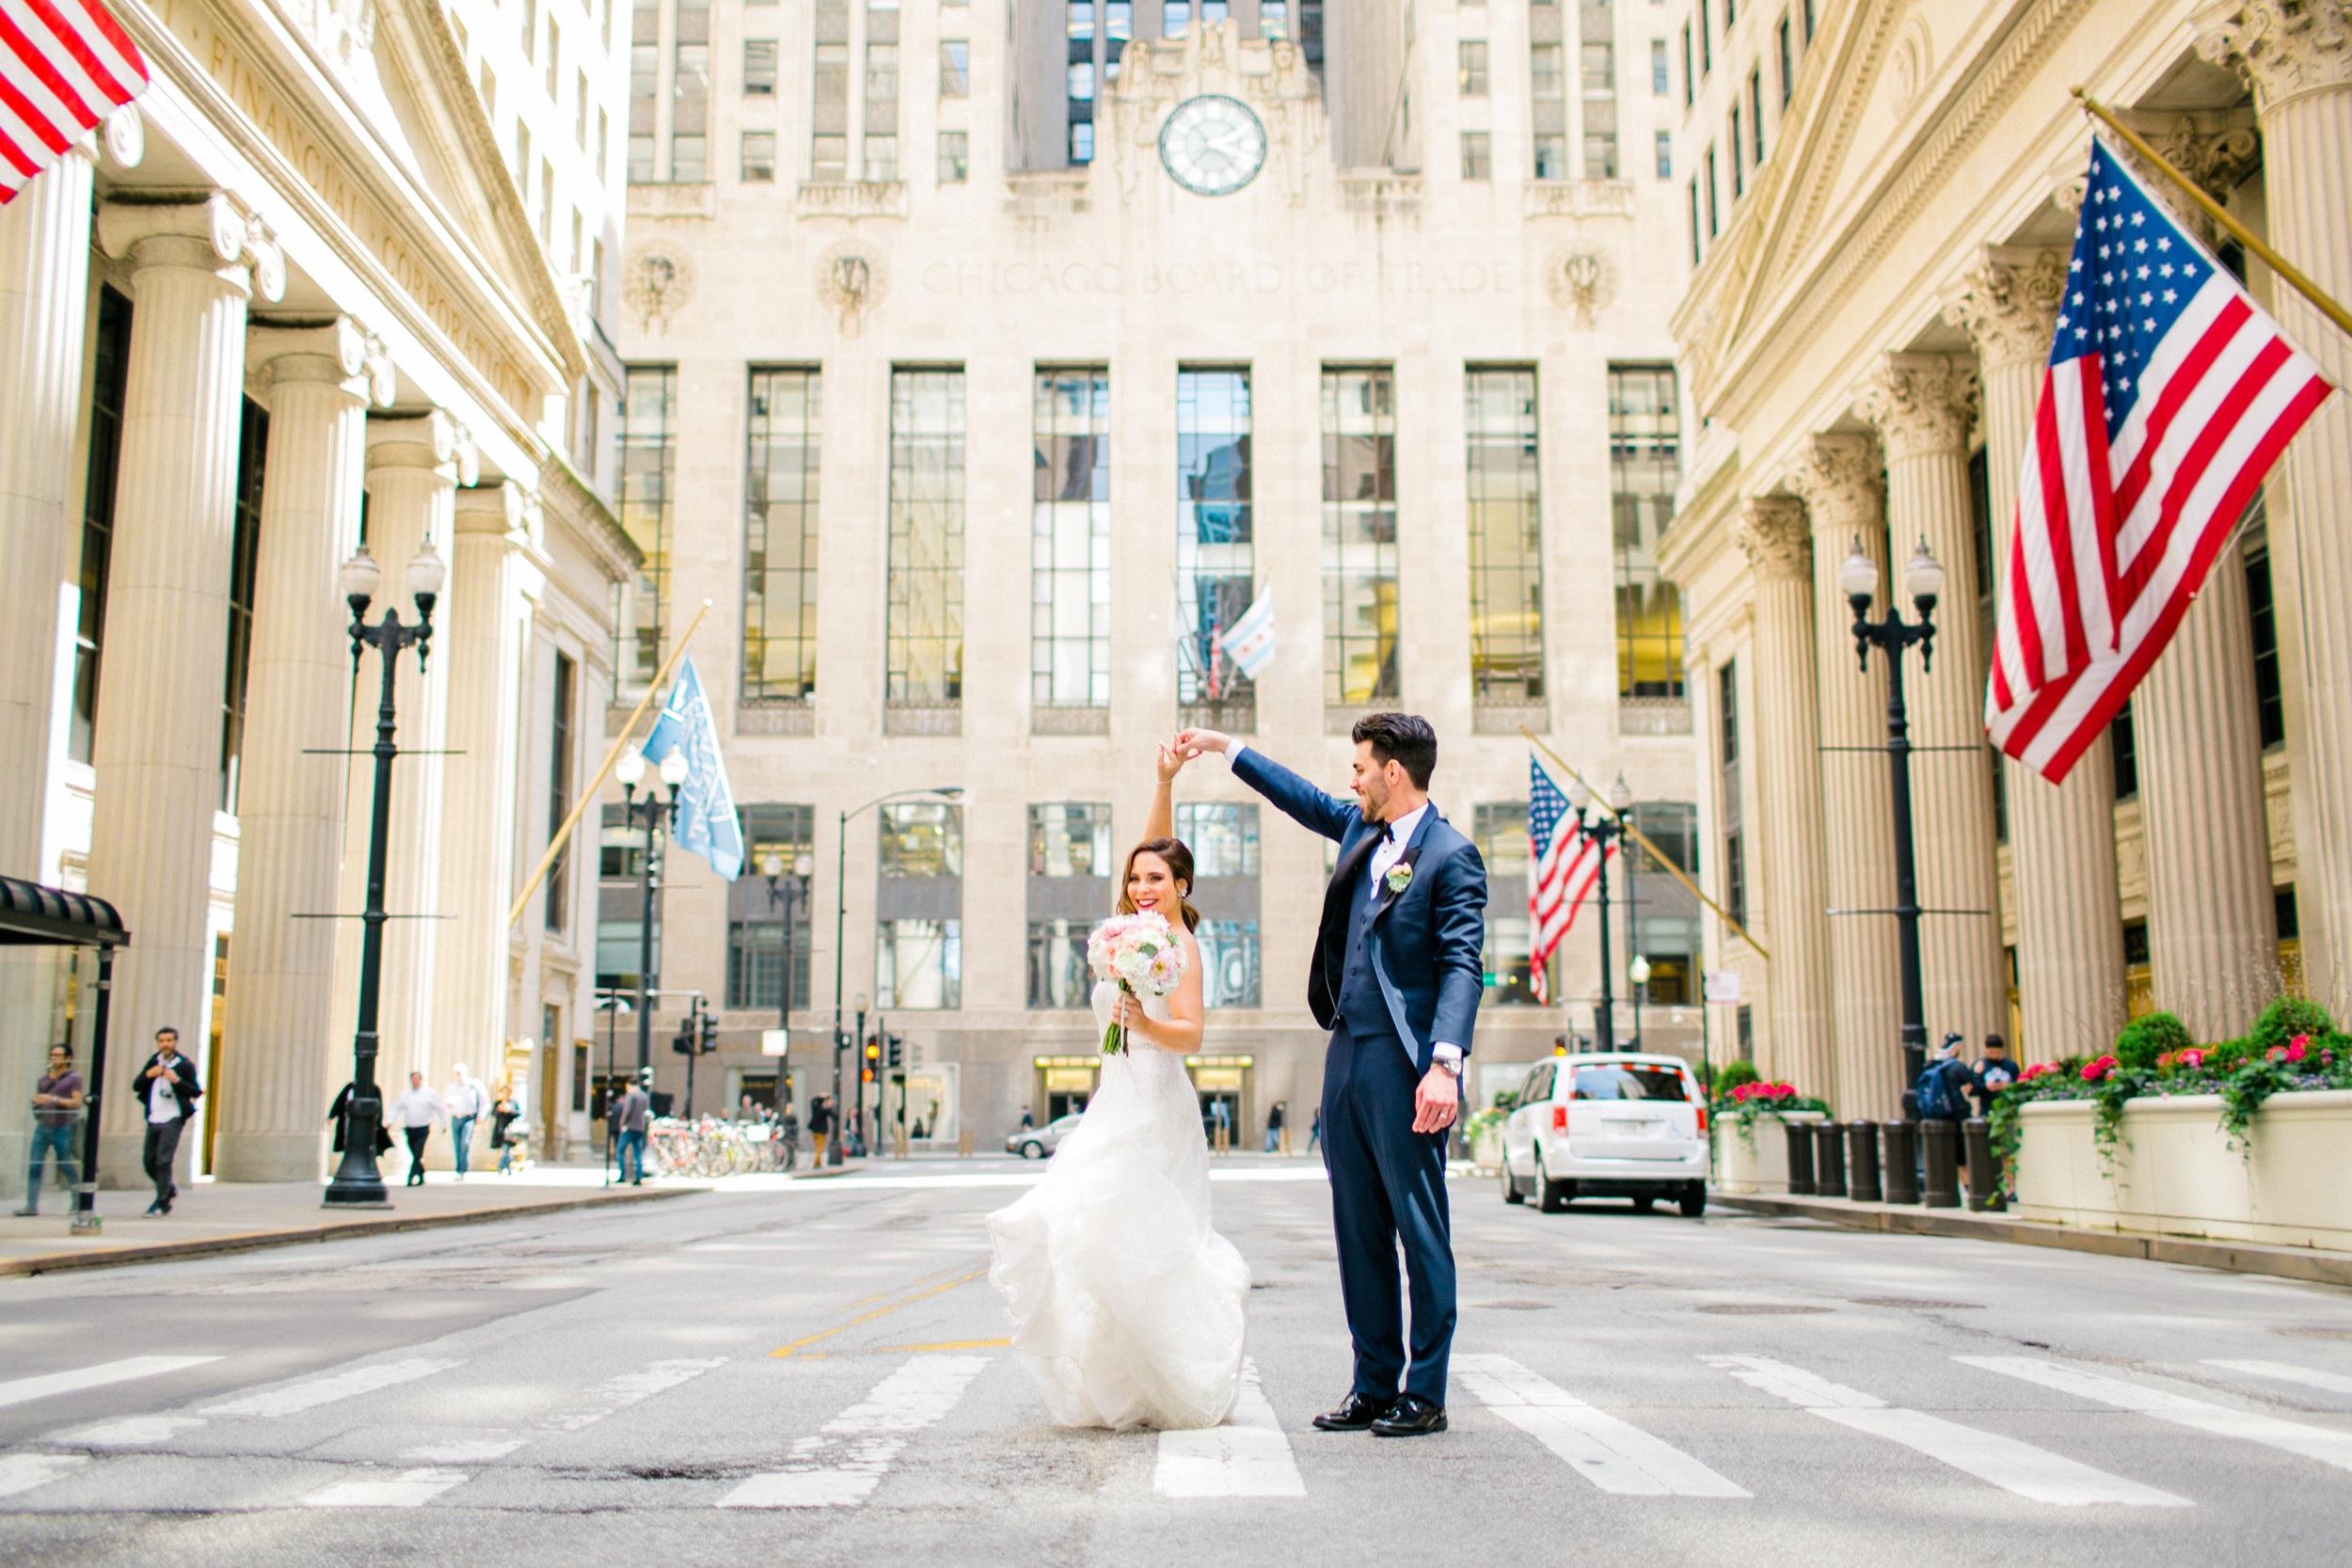 mayden_photography_weddings-60.jpg